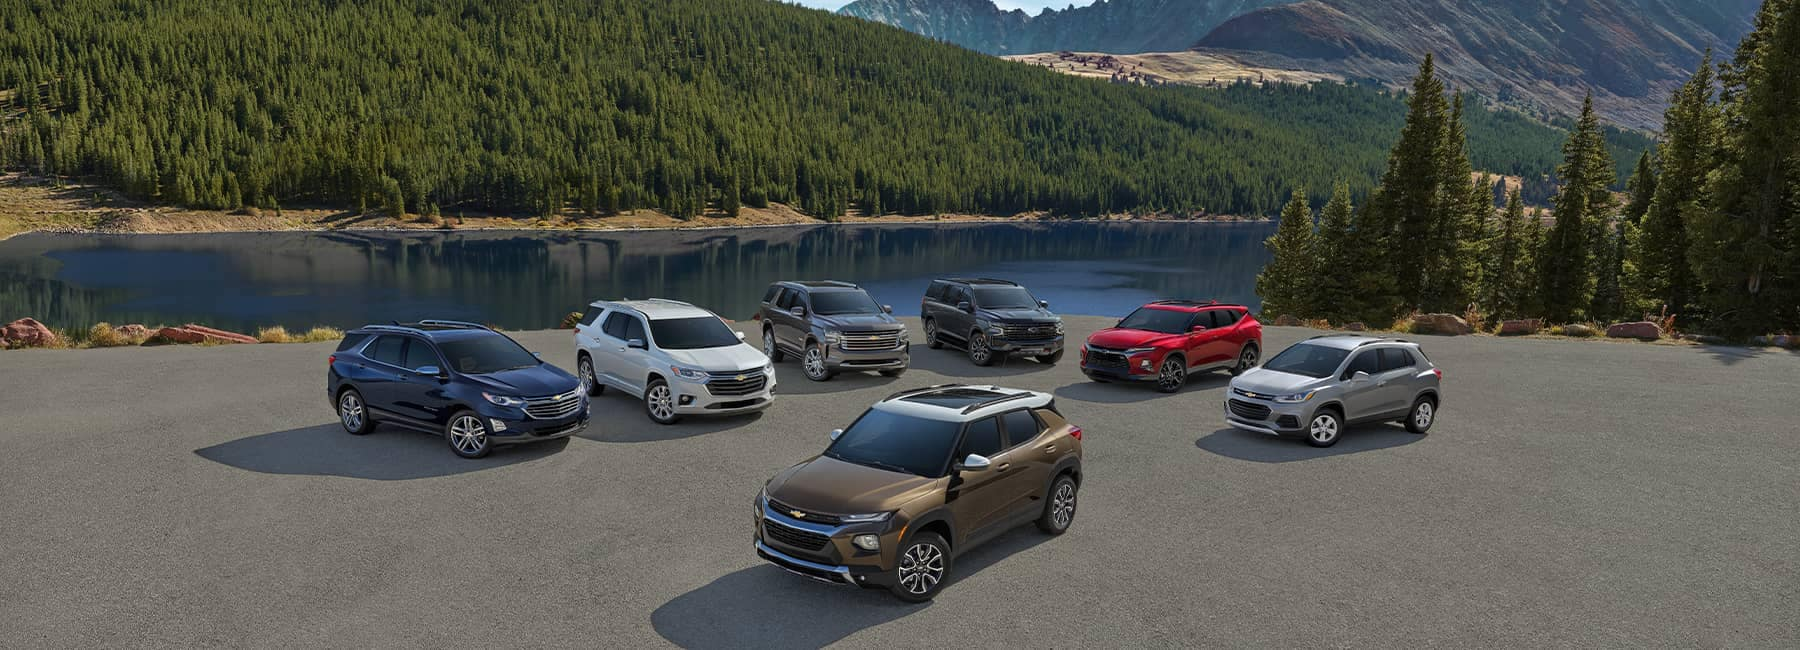 2020 Chevrolet SUV Lineup 2